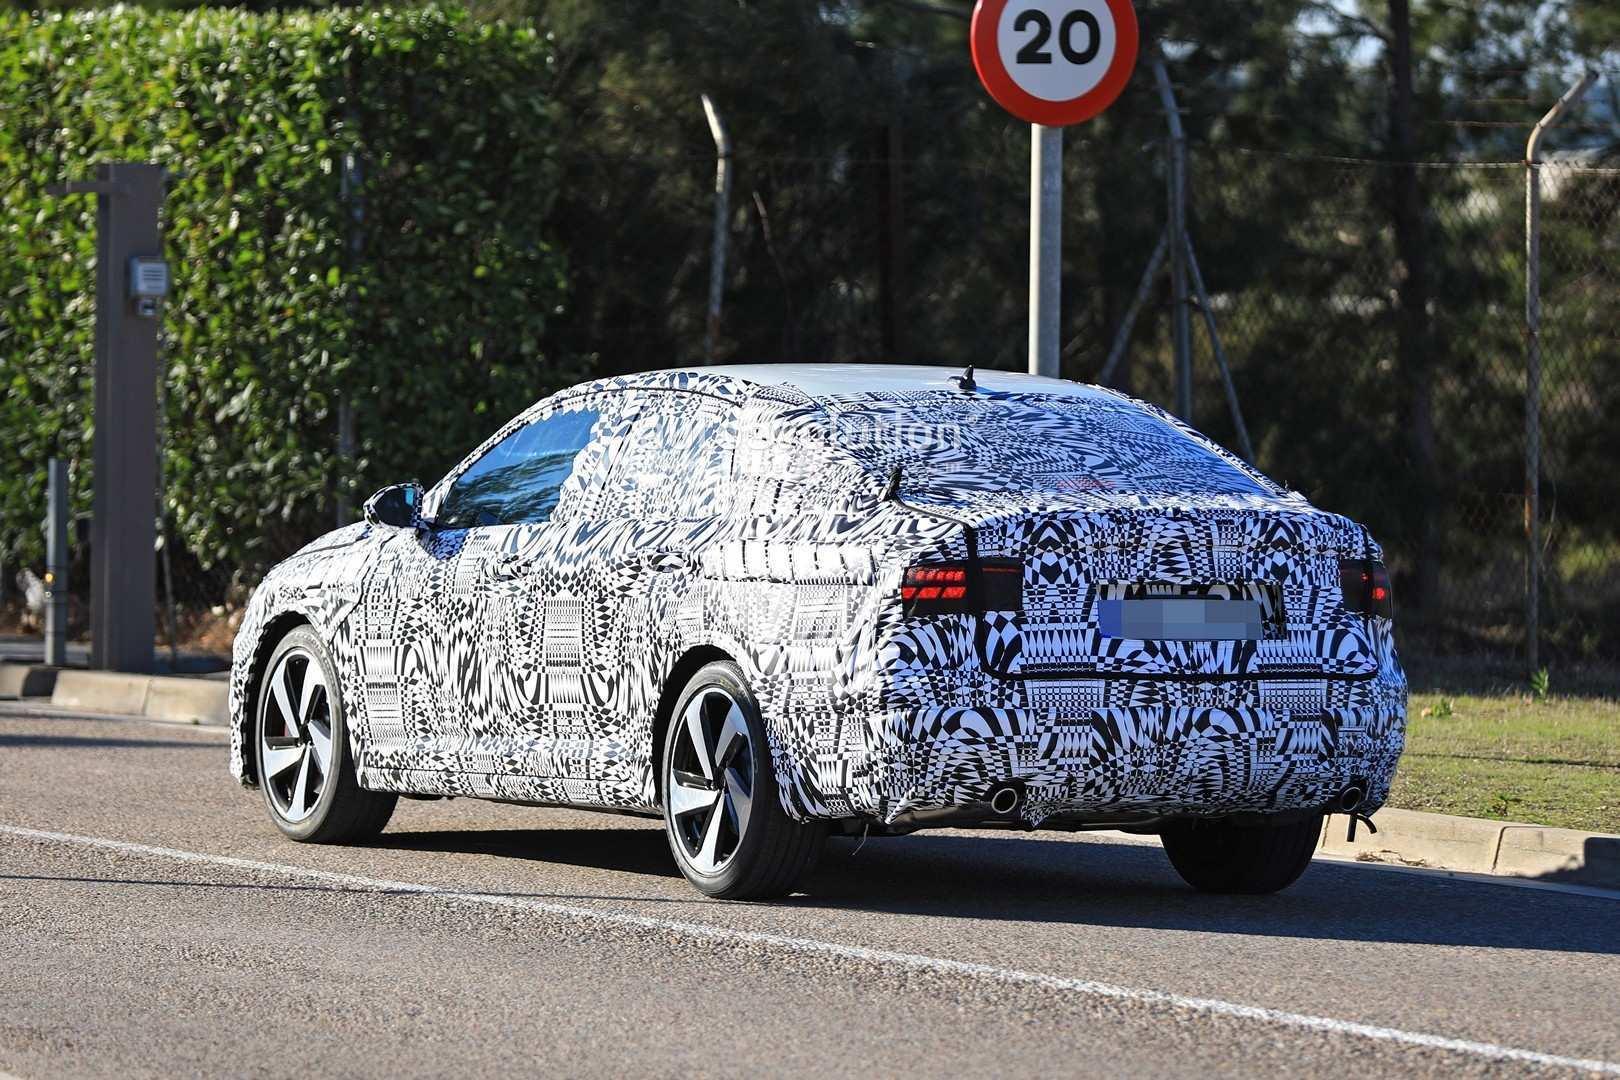 61 Concept of Volkswagen Jetta 2019 Used Spy Shoot New Concept by Volkswagen Jetta 2019 Used Spy Shoot